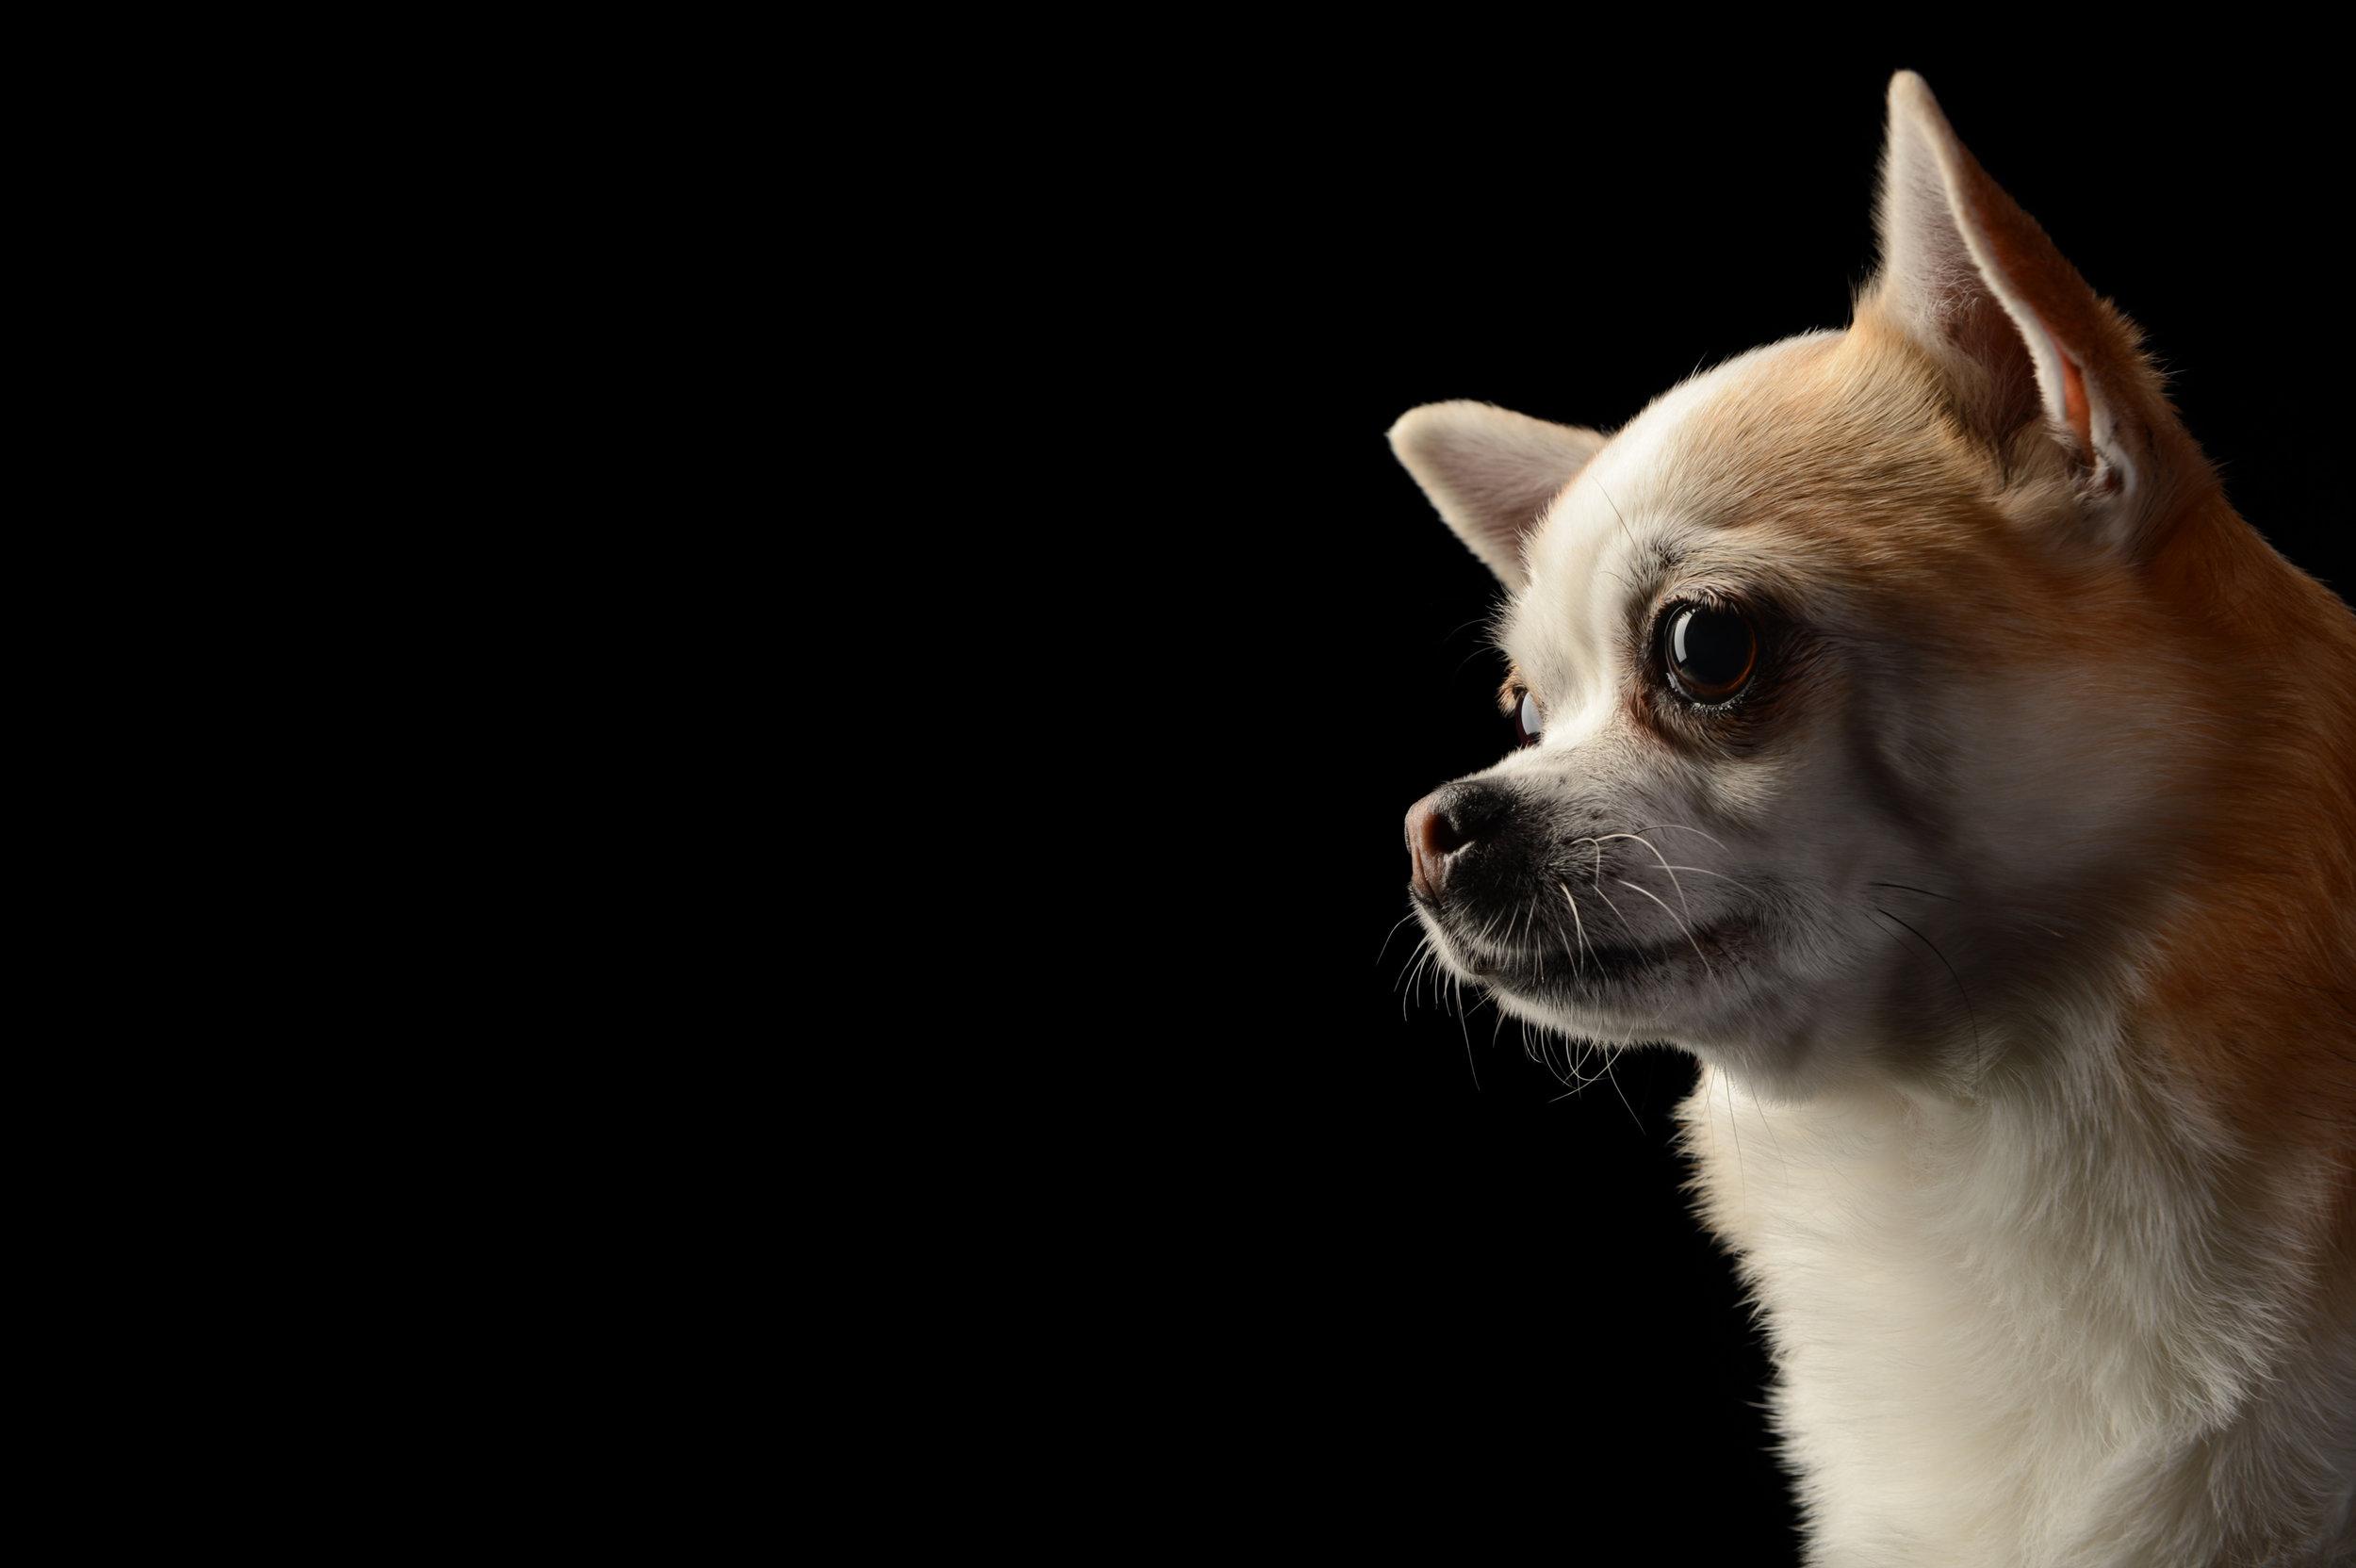 chihuahua_pet_dog_four_paws_portrait